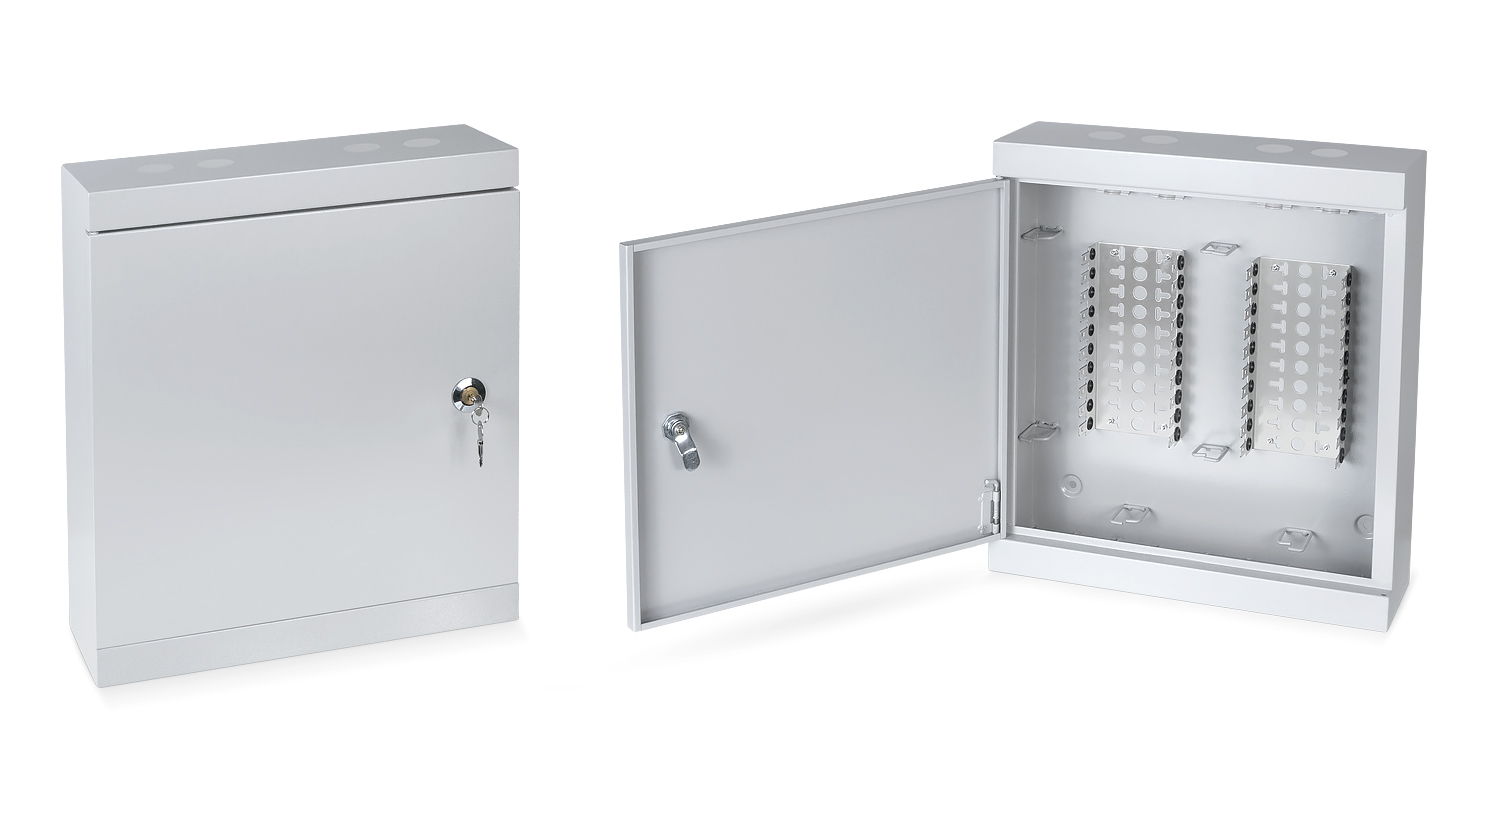 Cabeus DB-200P Коробка распределительная на 200 пар, 450х420х75 мм